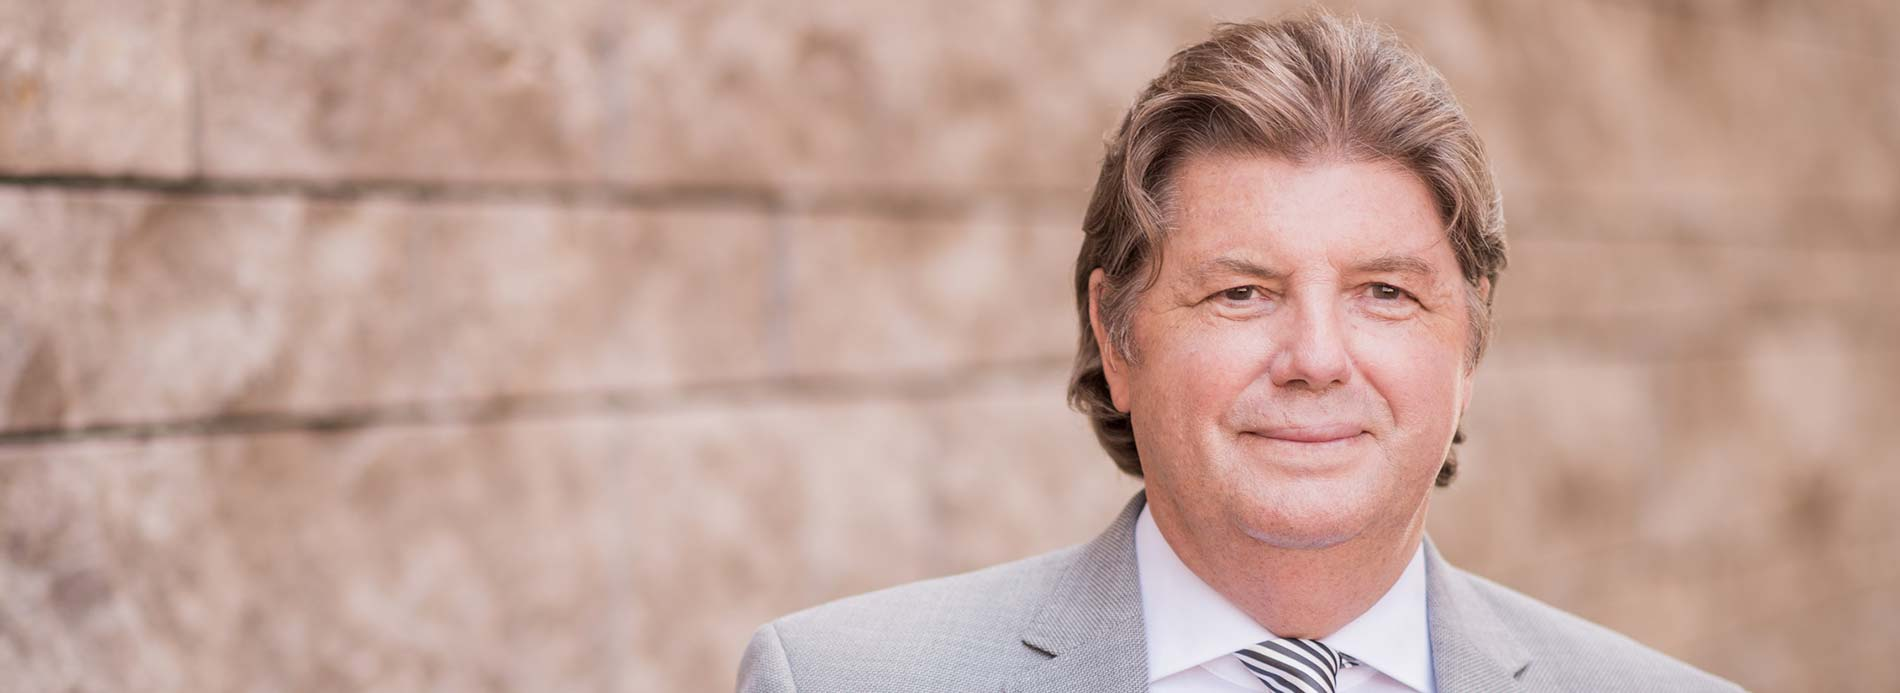 Dr. Christian Weinelt - Rechtsanwalt in Regensburg